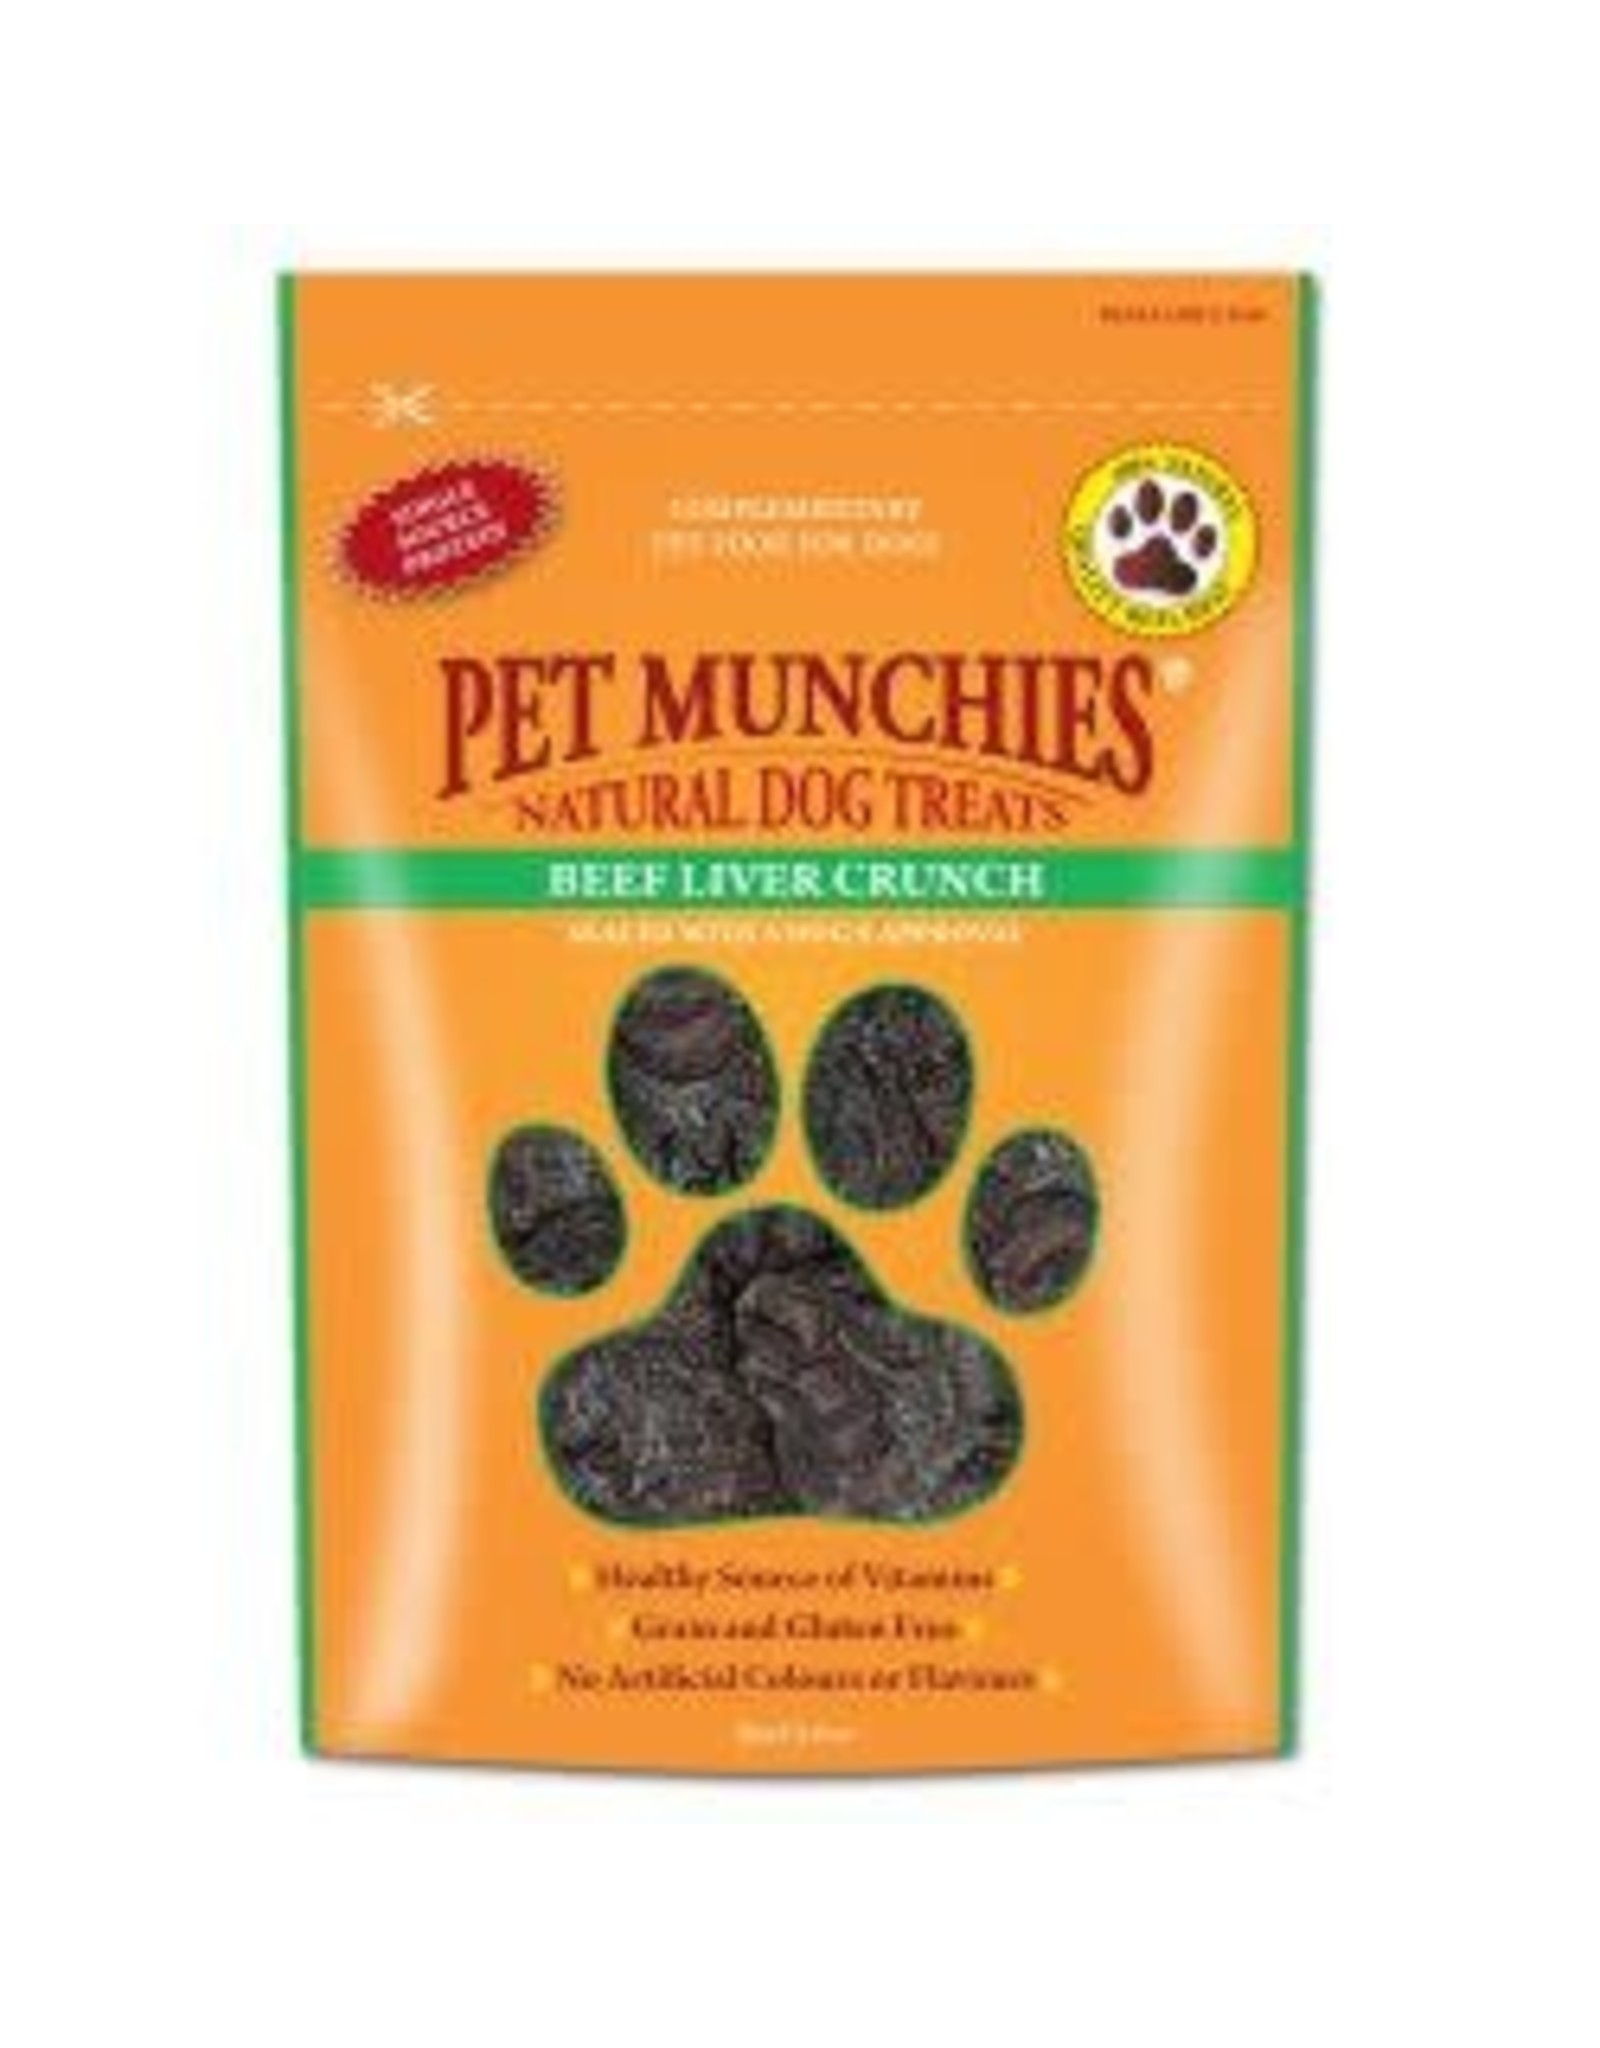 Pet Munchies Pet Munchies Beef Liver Crunch 90g